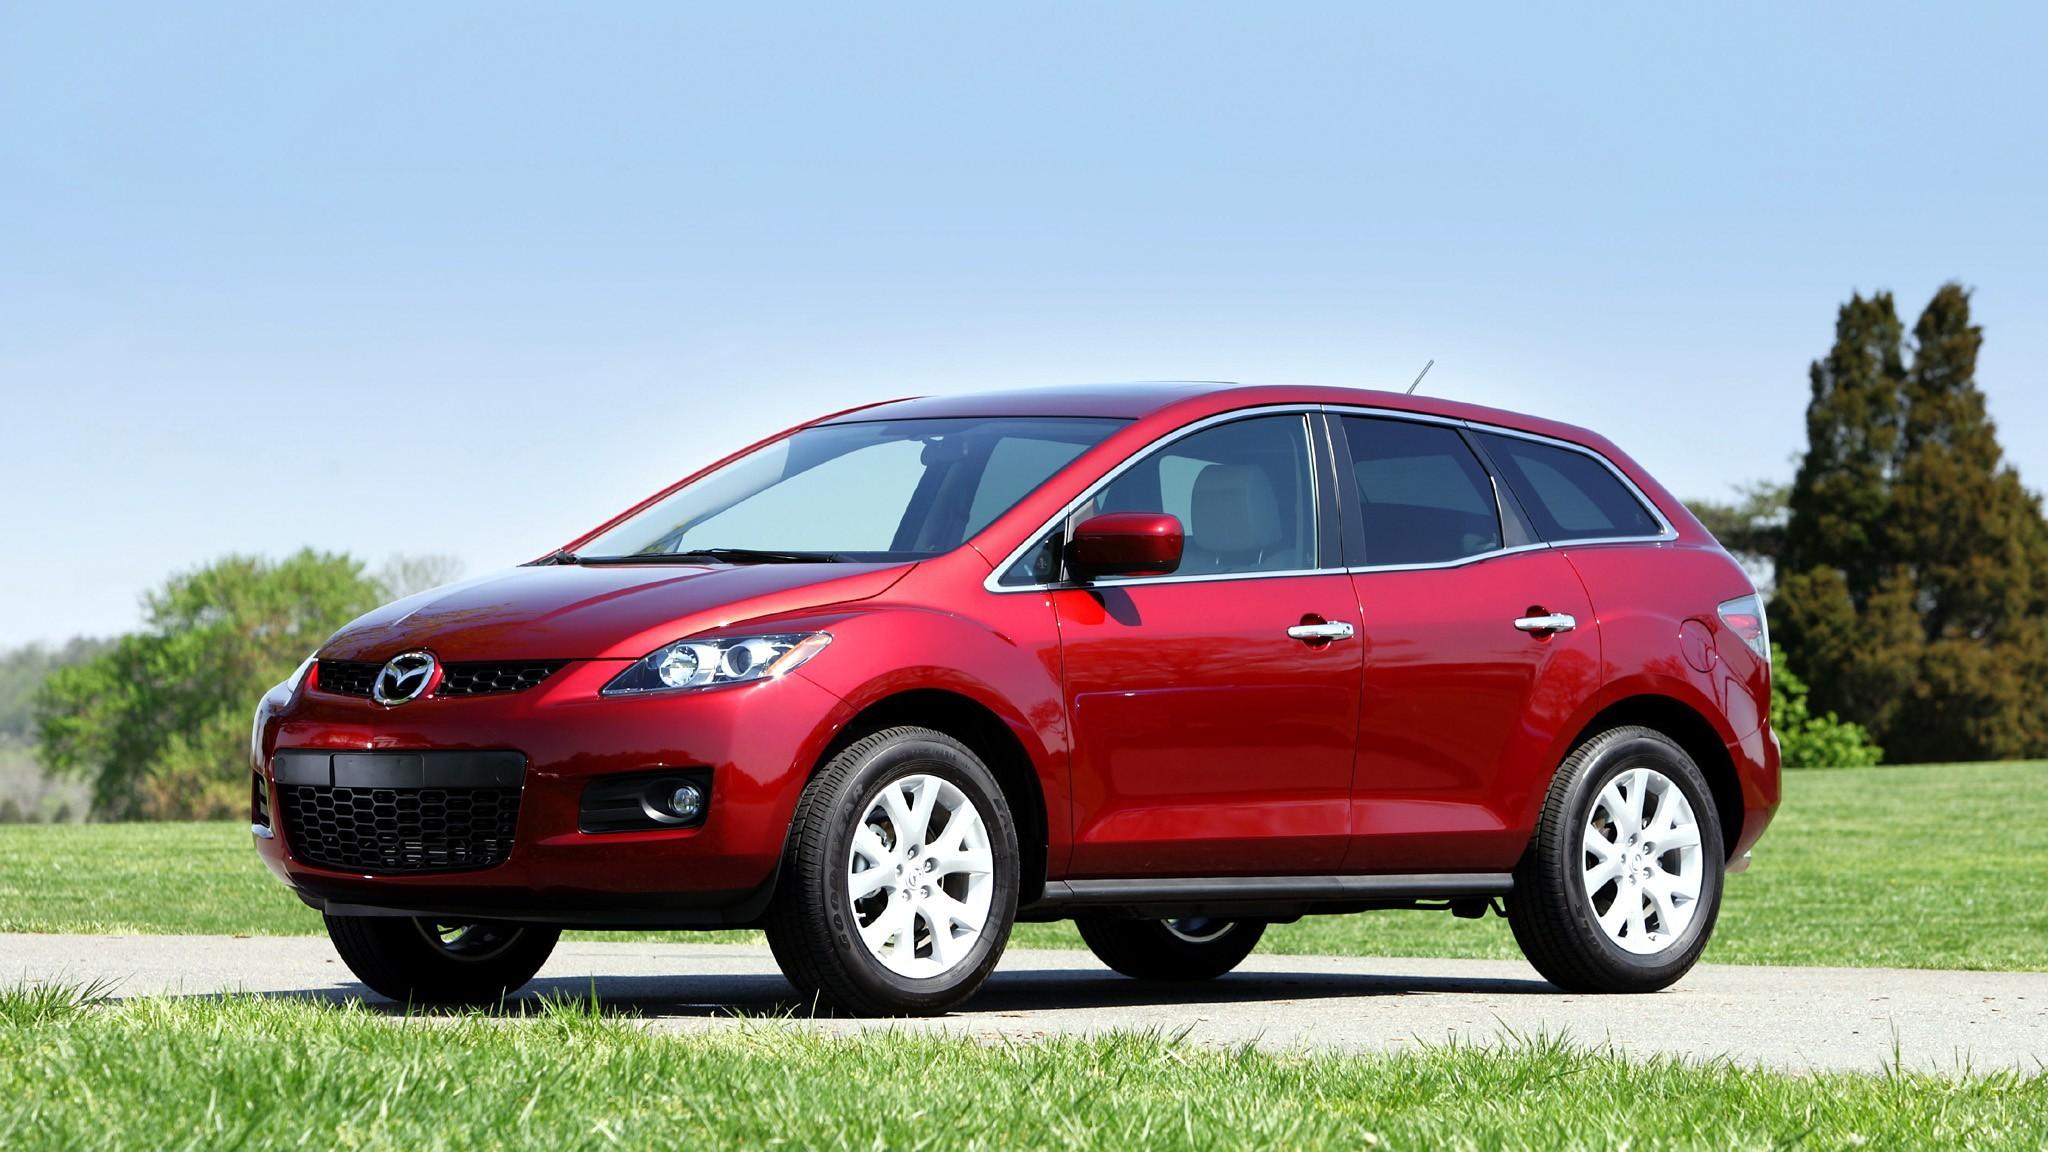 На фото: Mazda CX-7 для рынка США